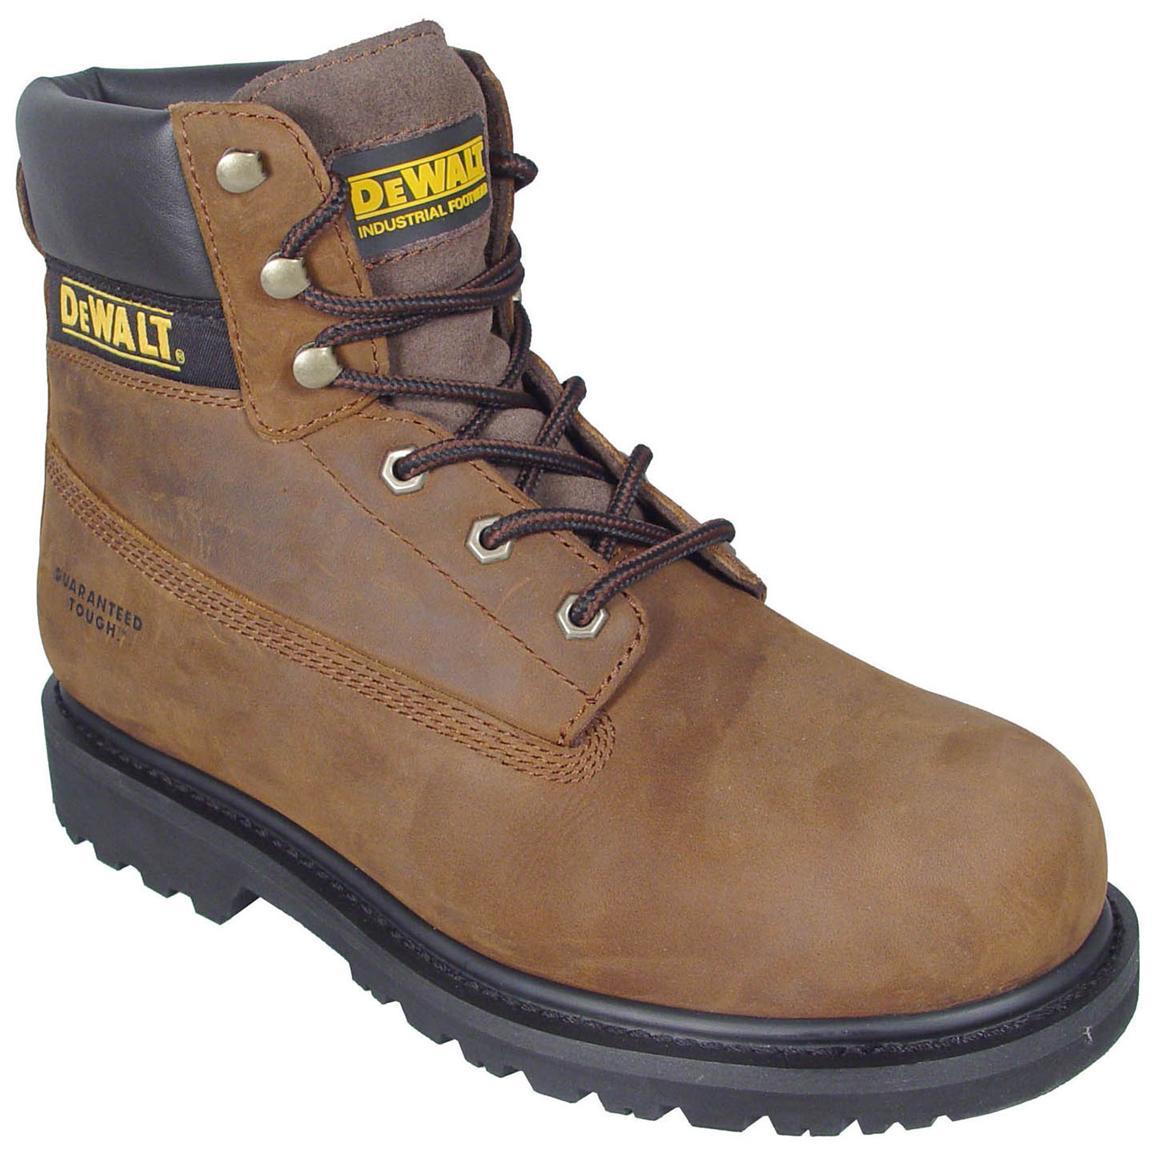 Make Steel Toe Boots Comfortable